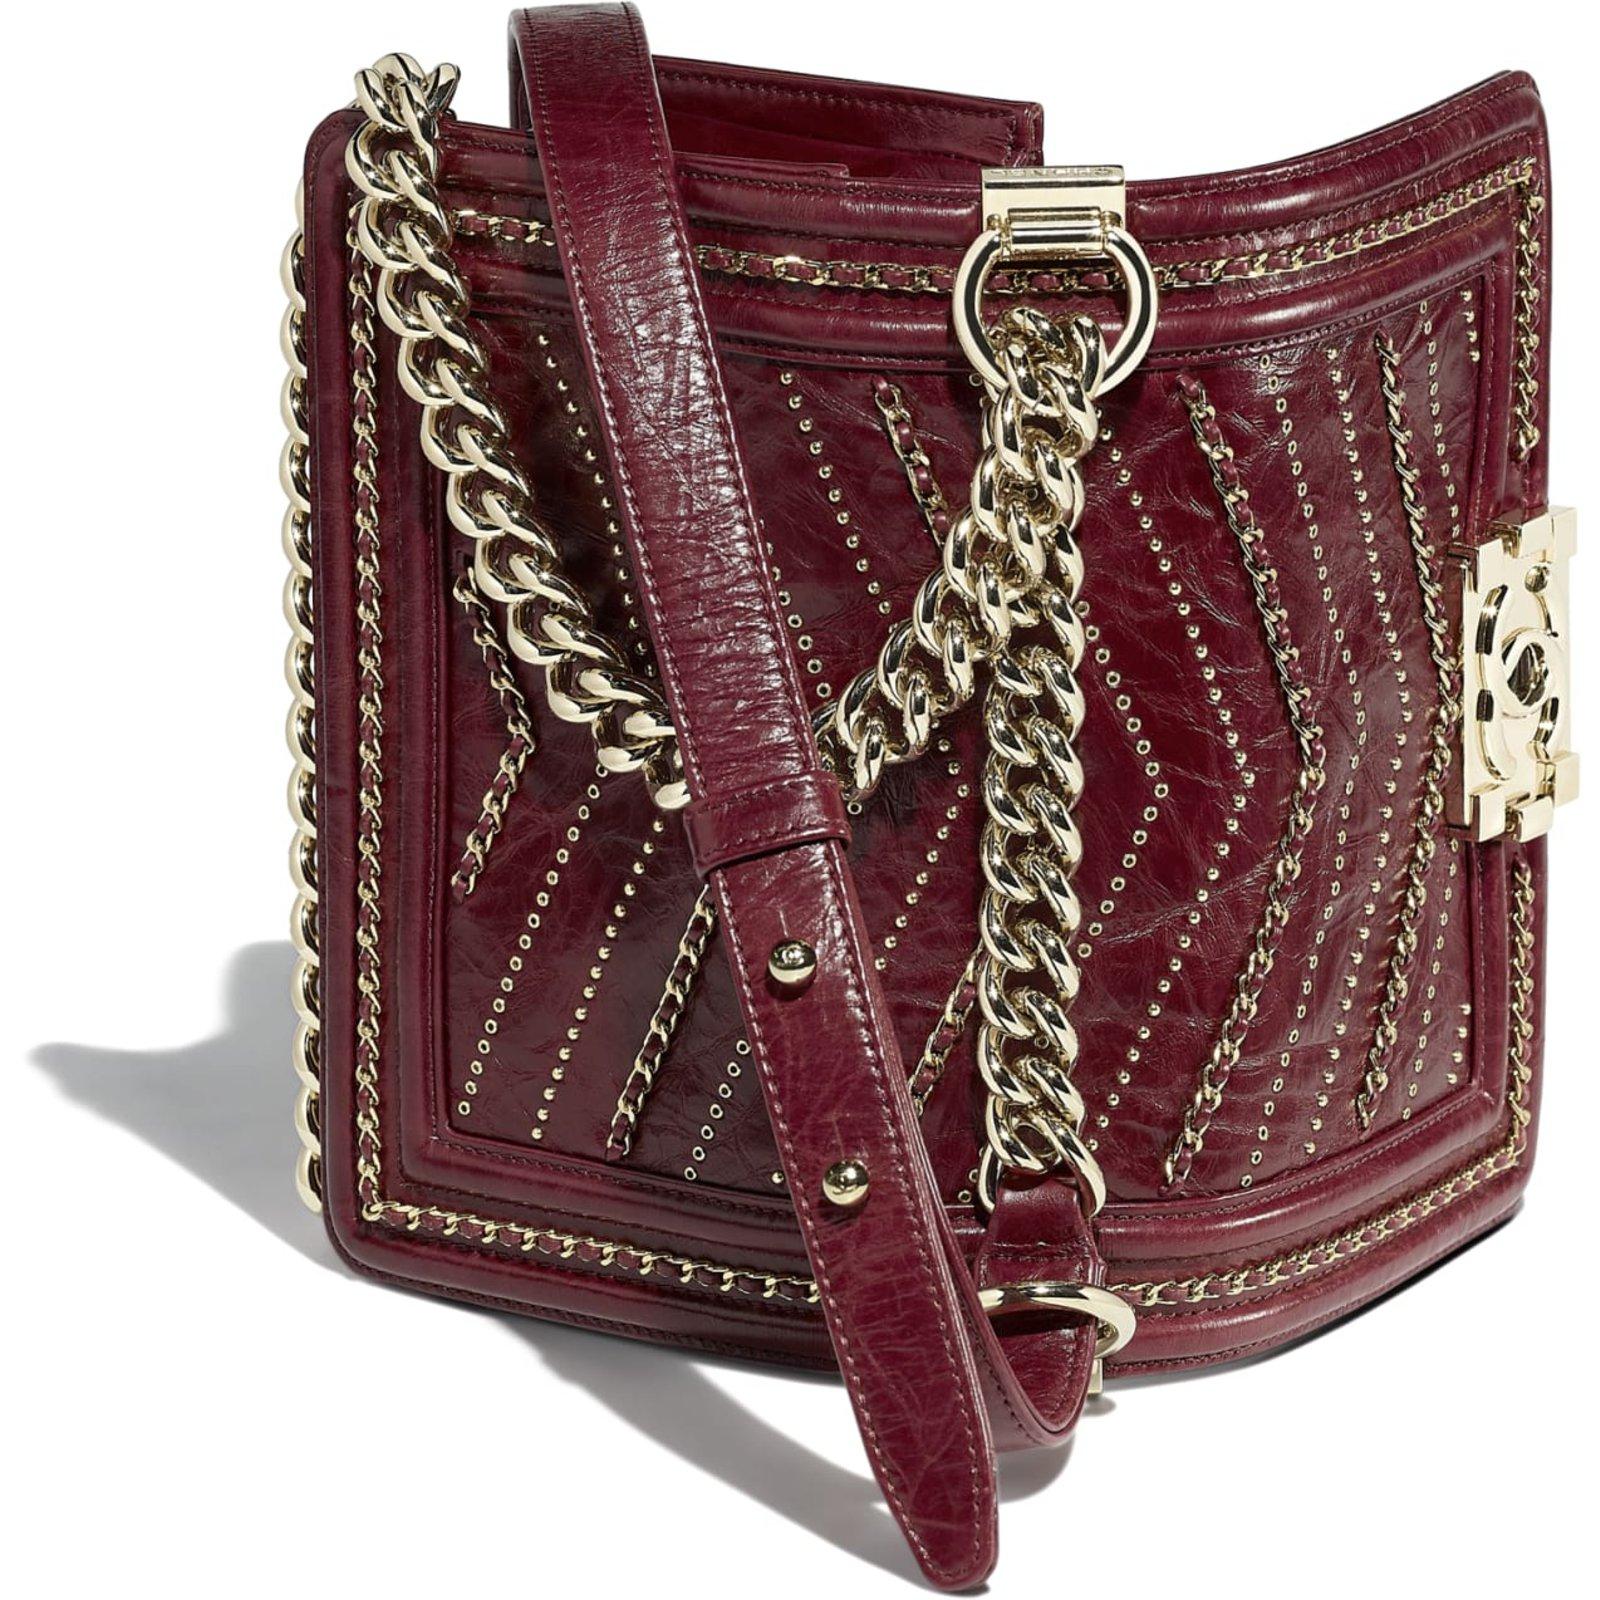 59c91e54ecbd55 Chanel Chanel boy small red Handbags Leather Red ref.99177 - Joli Closet